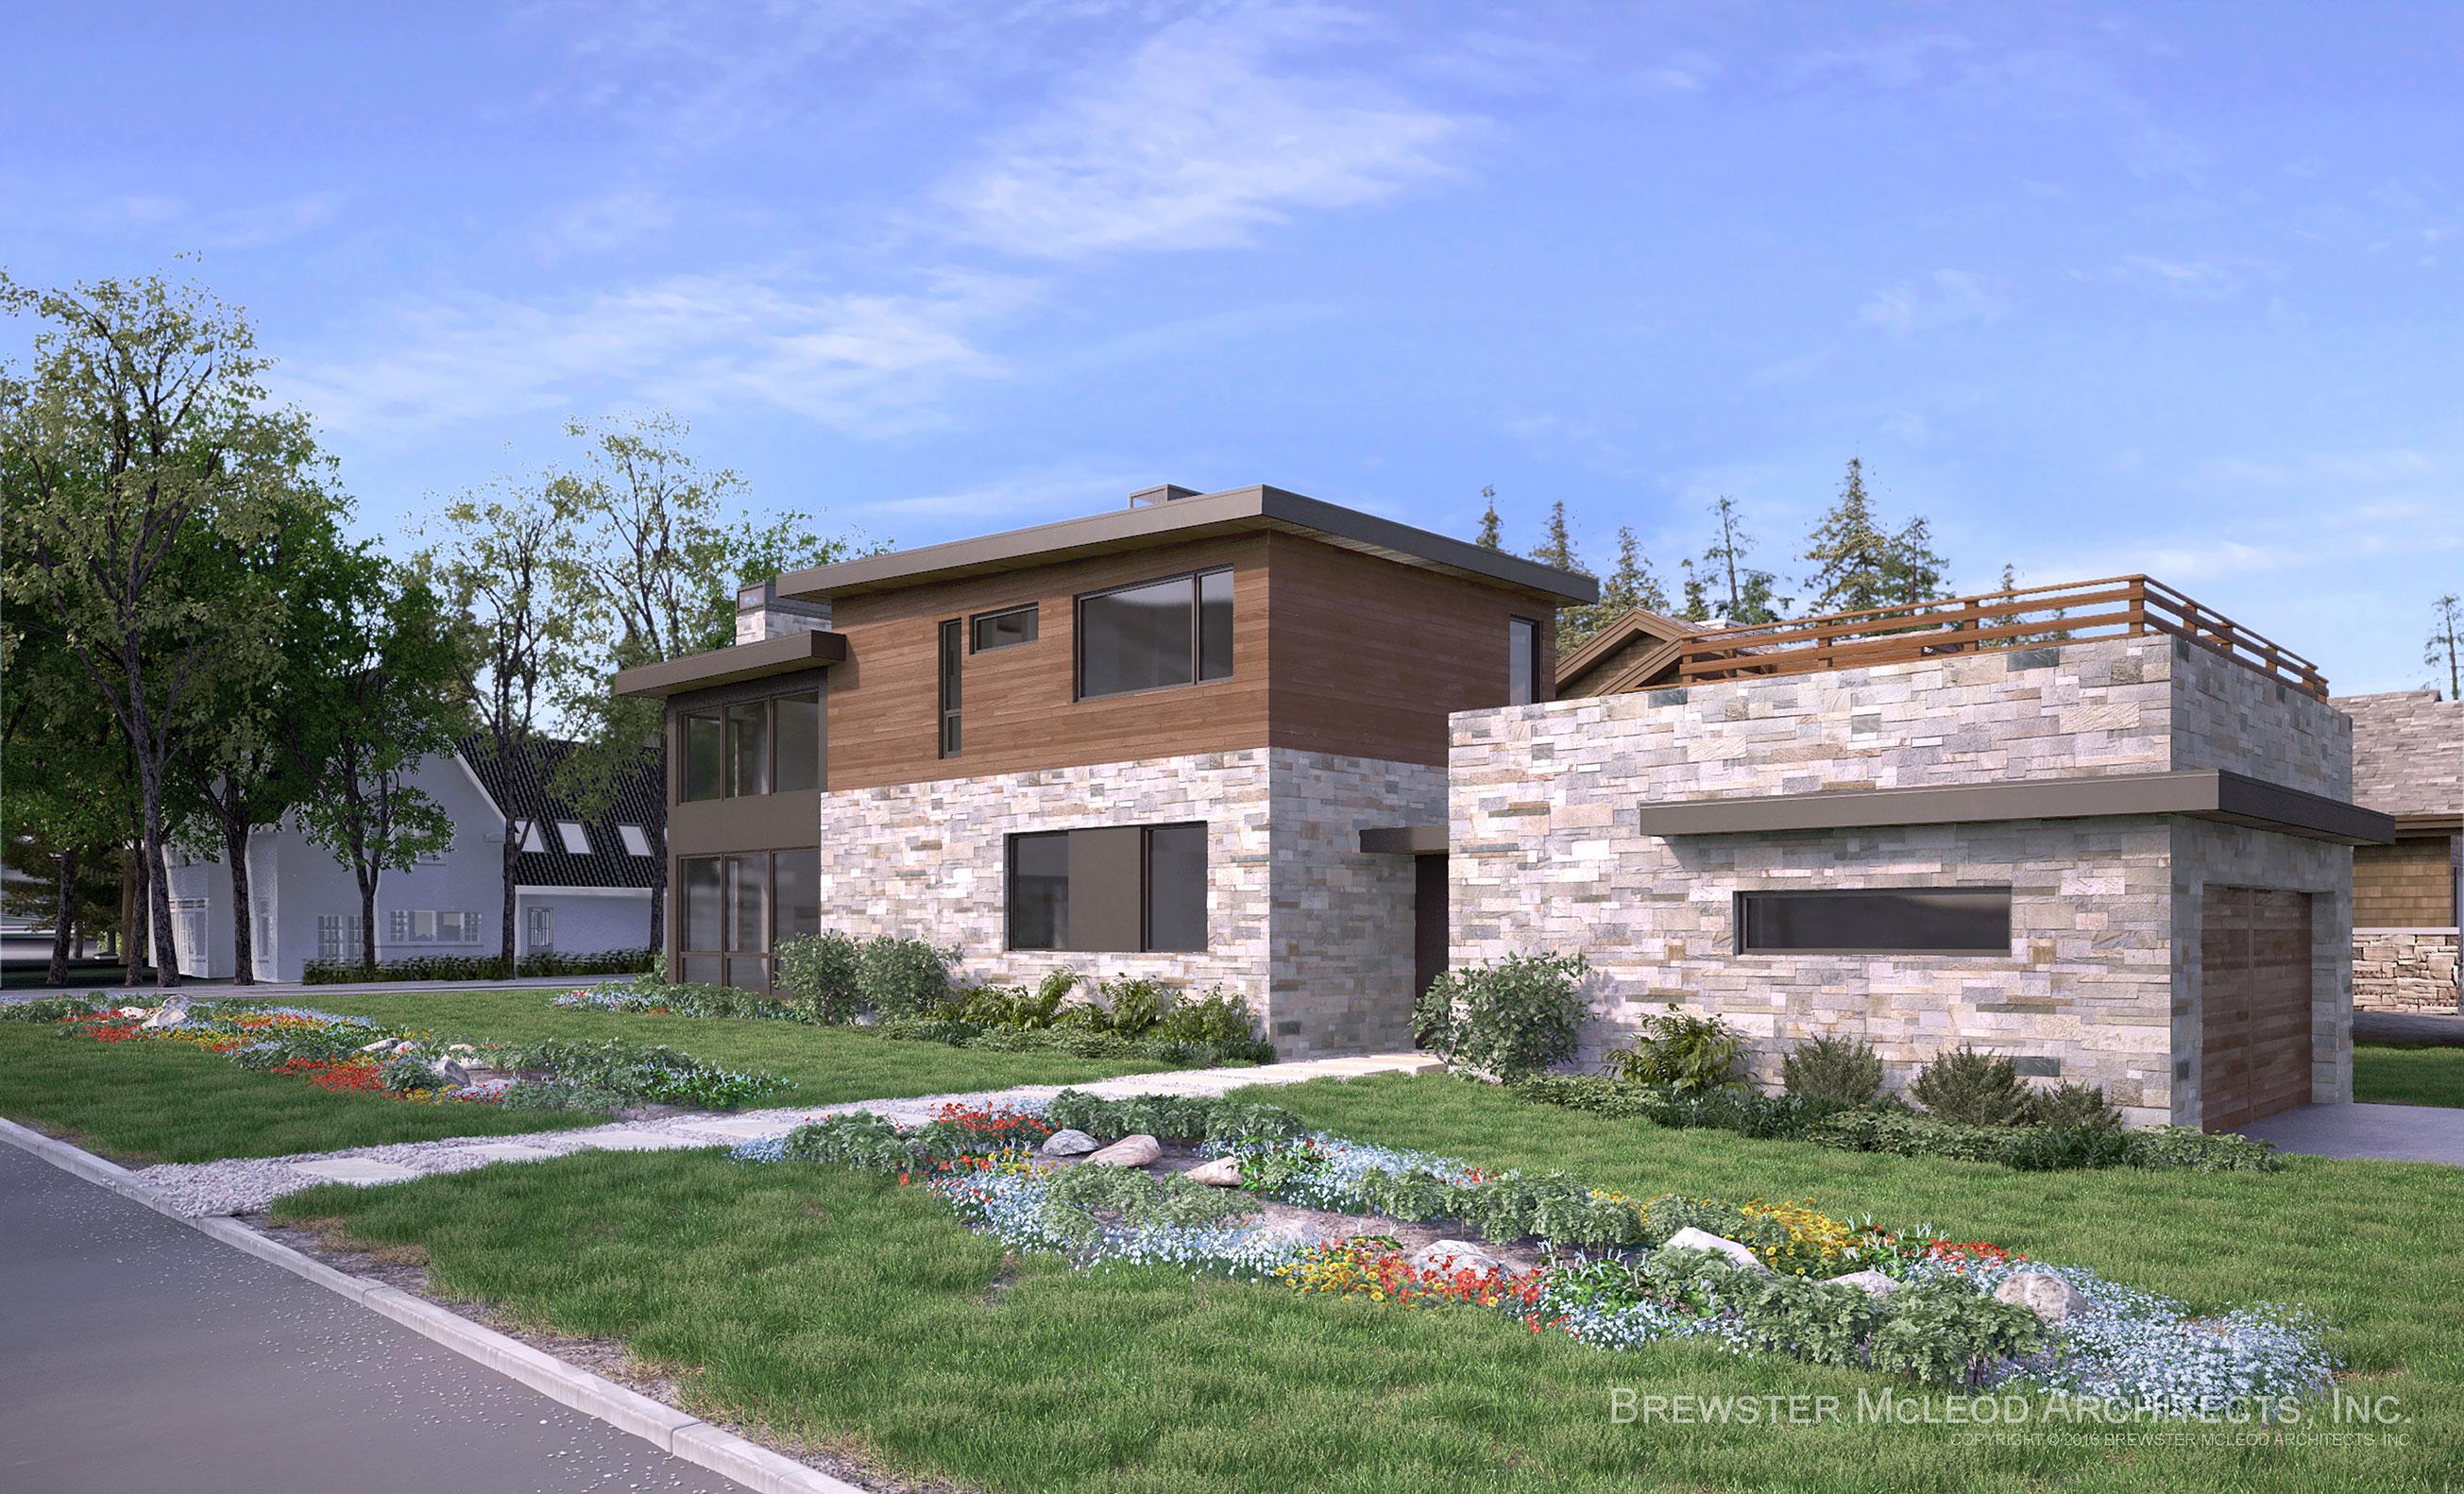 Brewster McLeod Architects Smuggler Residence Aspen